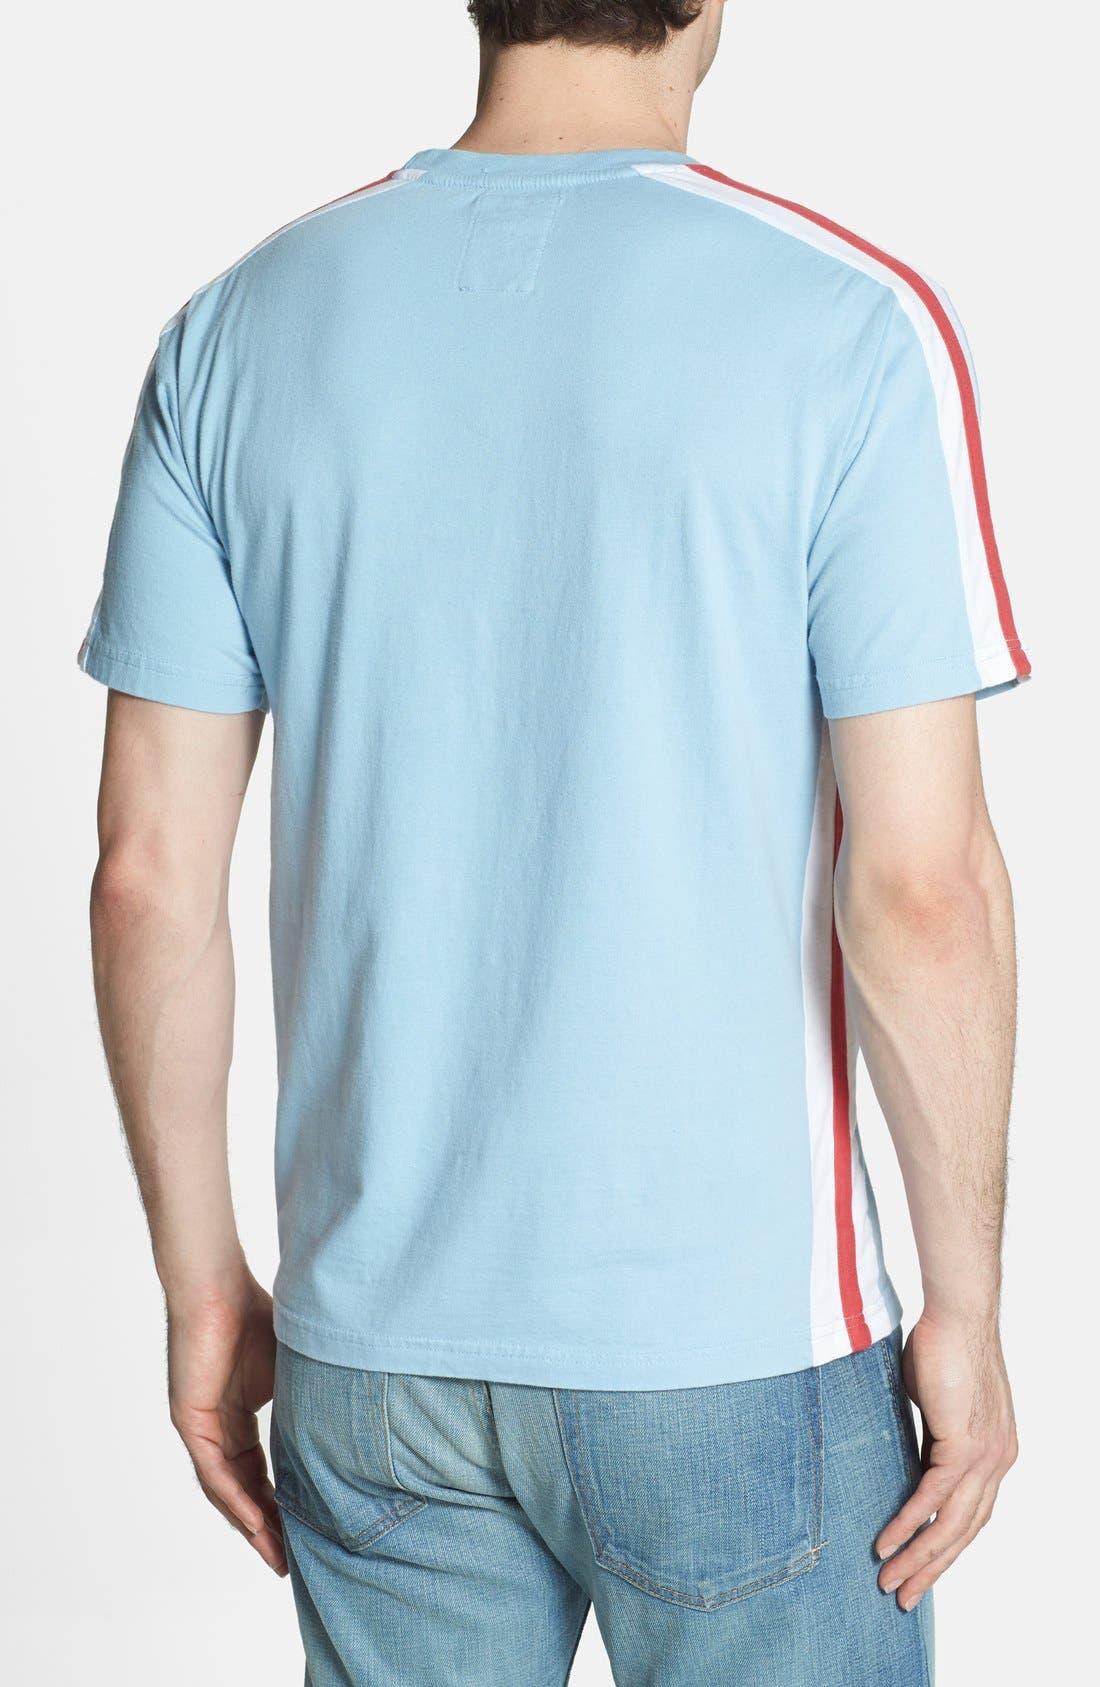 Alternate Image 2  - Red Jacket 'Expos - Remote Control' T-Shirt (Men)